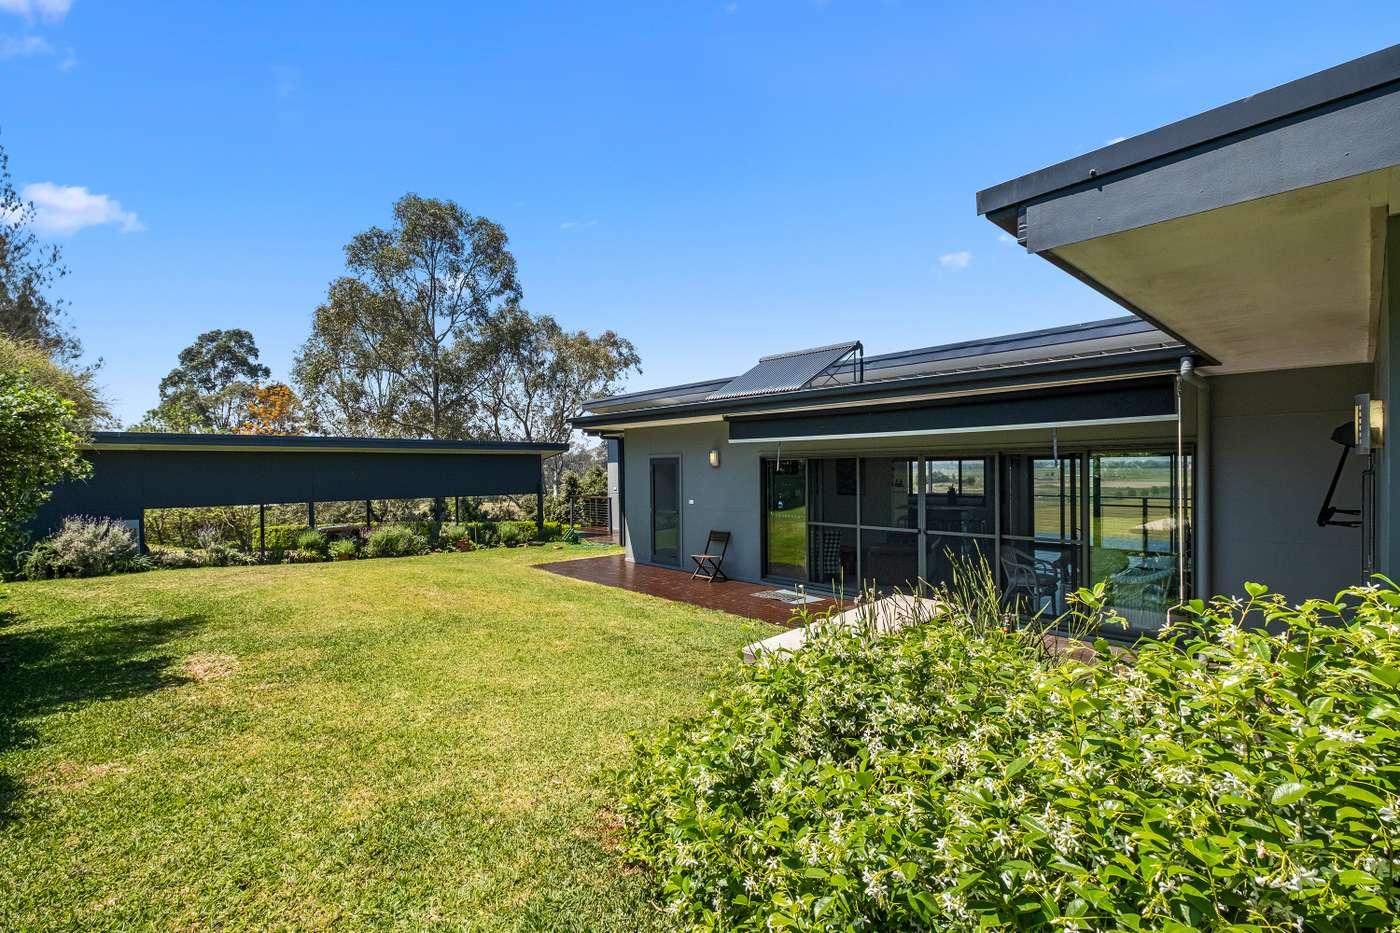 Main view of Homely rural listing, 34 Gorricks Lane, Freemans Reach, NSW 2756